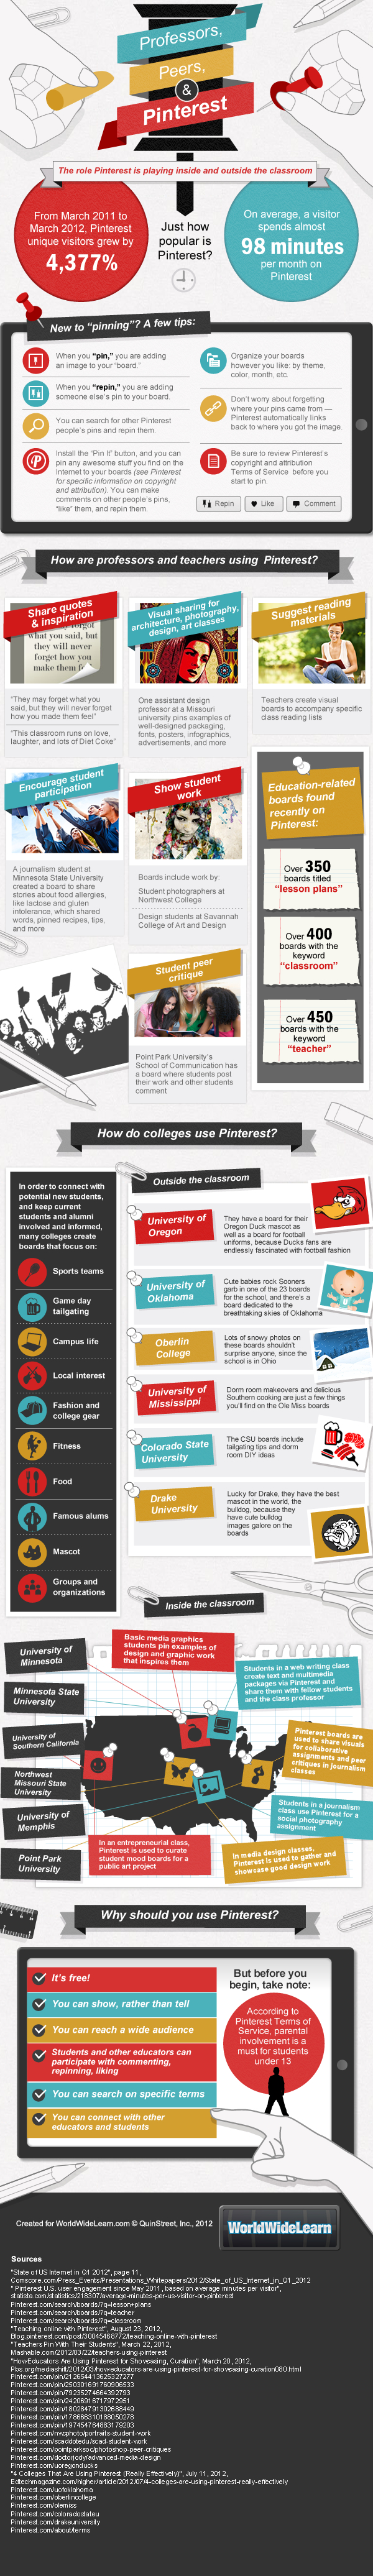 professors-peers-pinterest